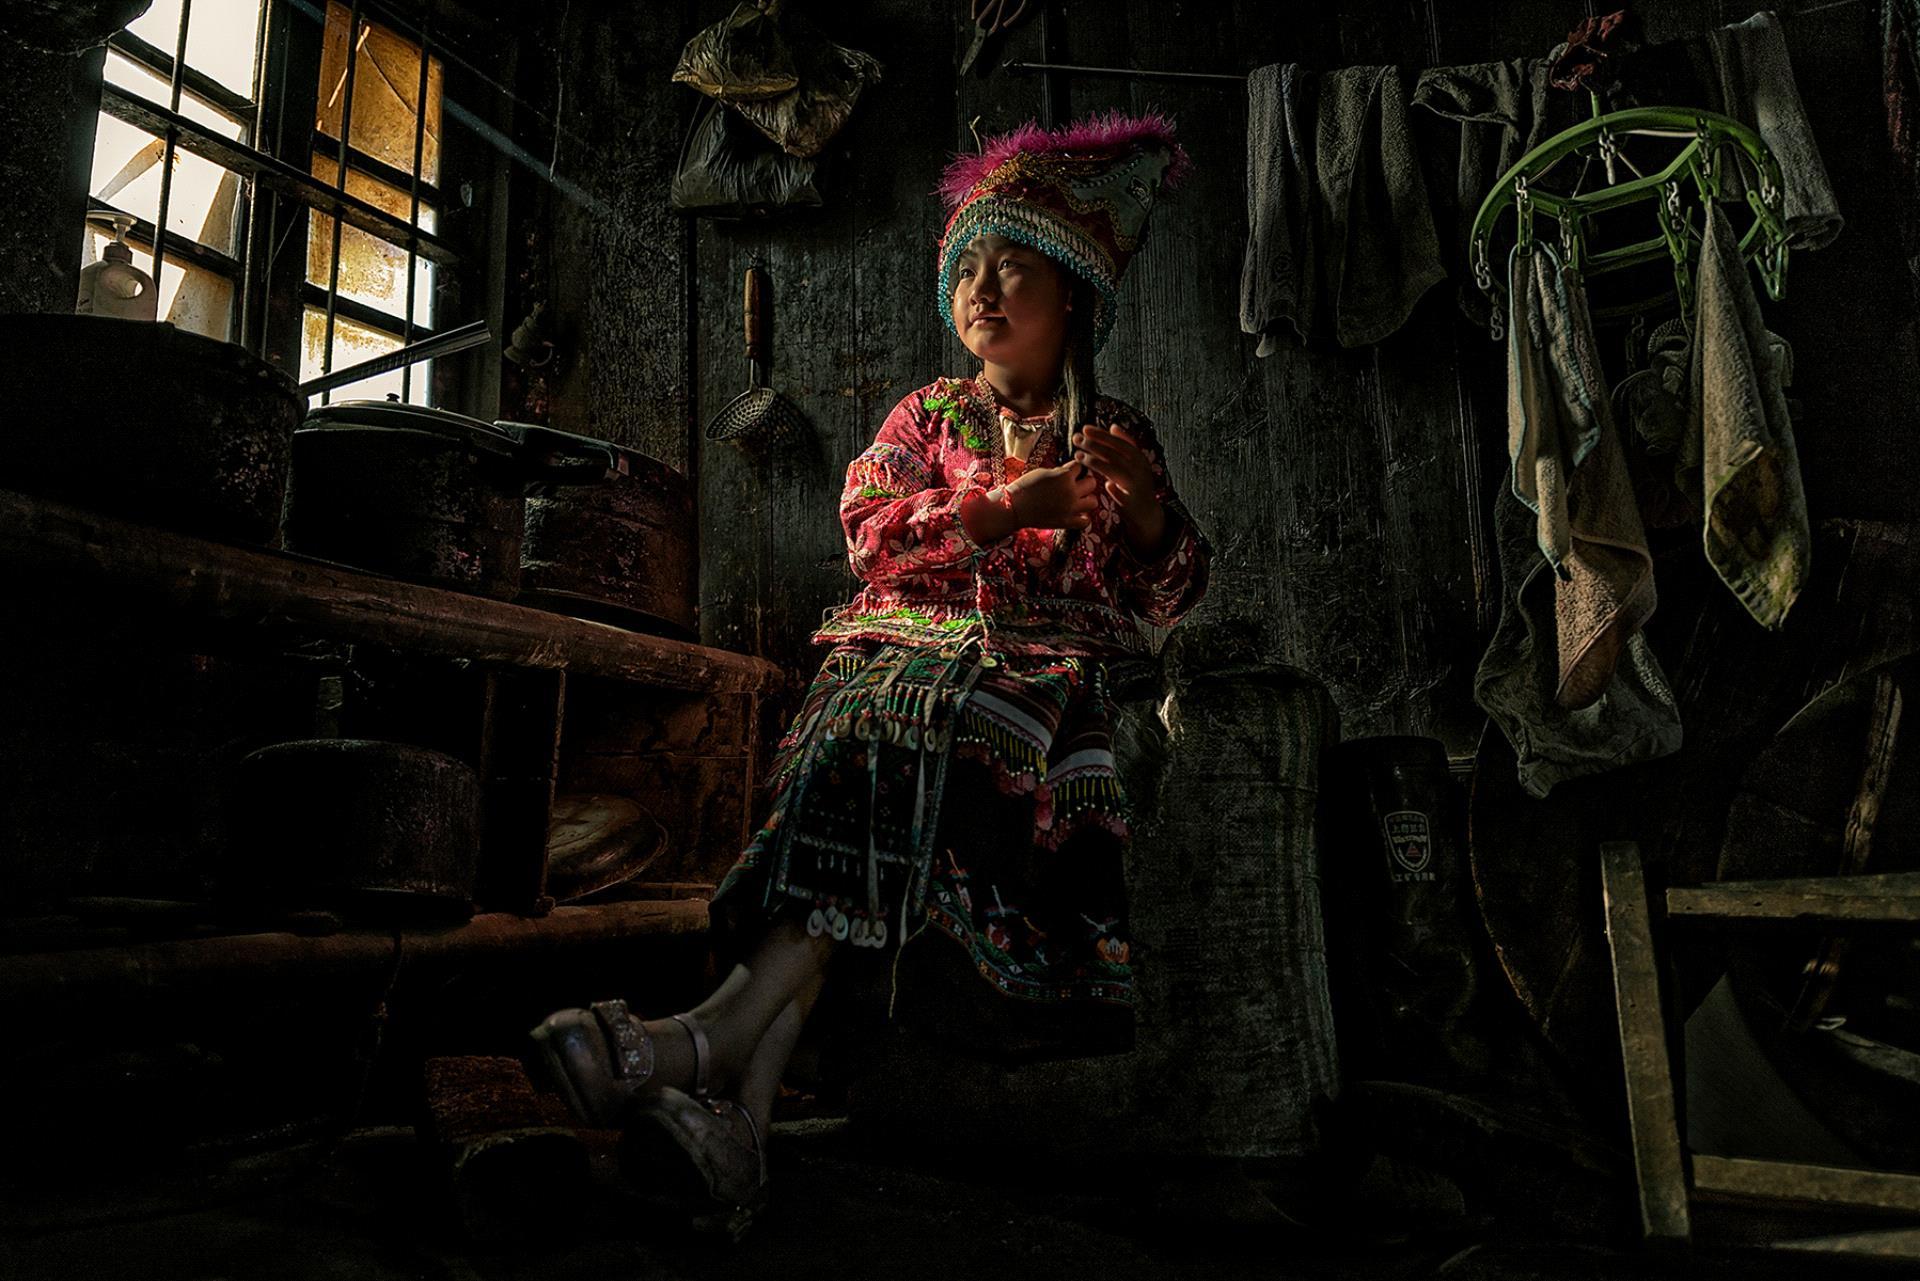 DIPA Merit Award - Minglei Nong (China)  The Dressed Girl